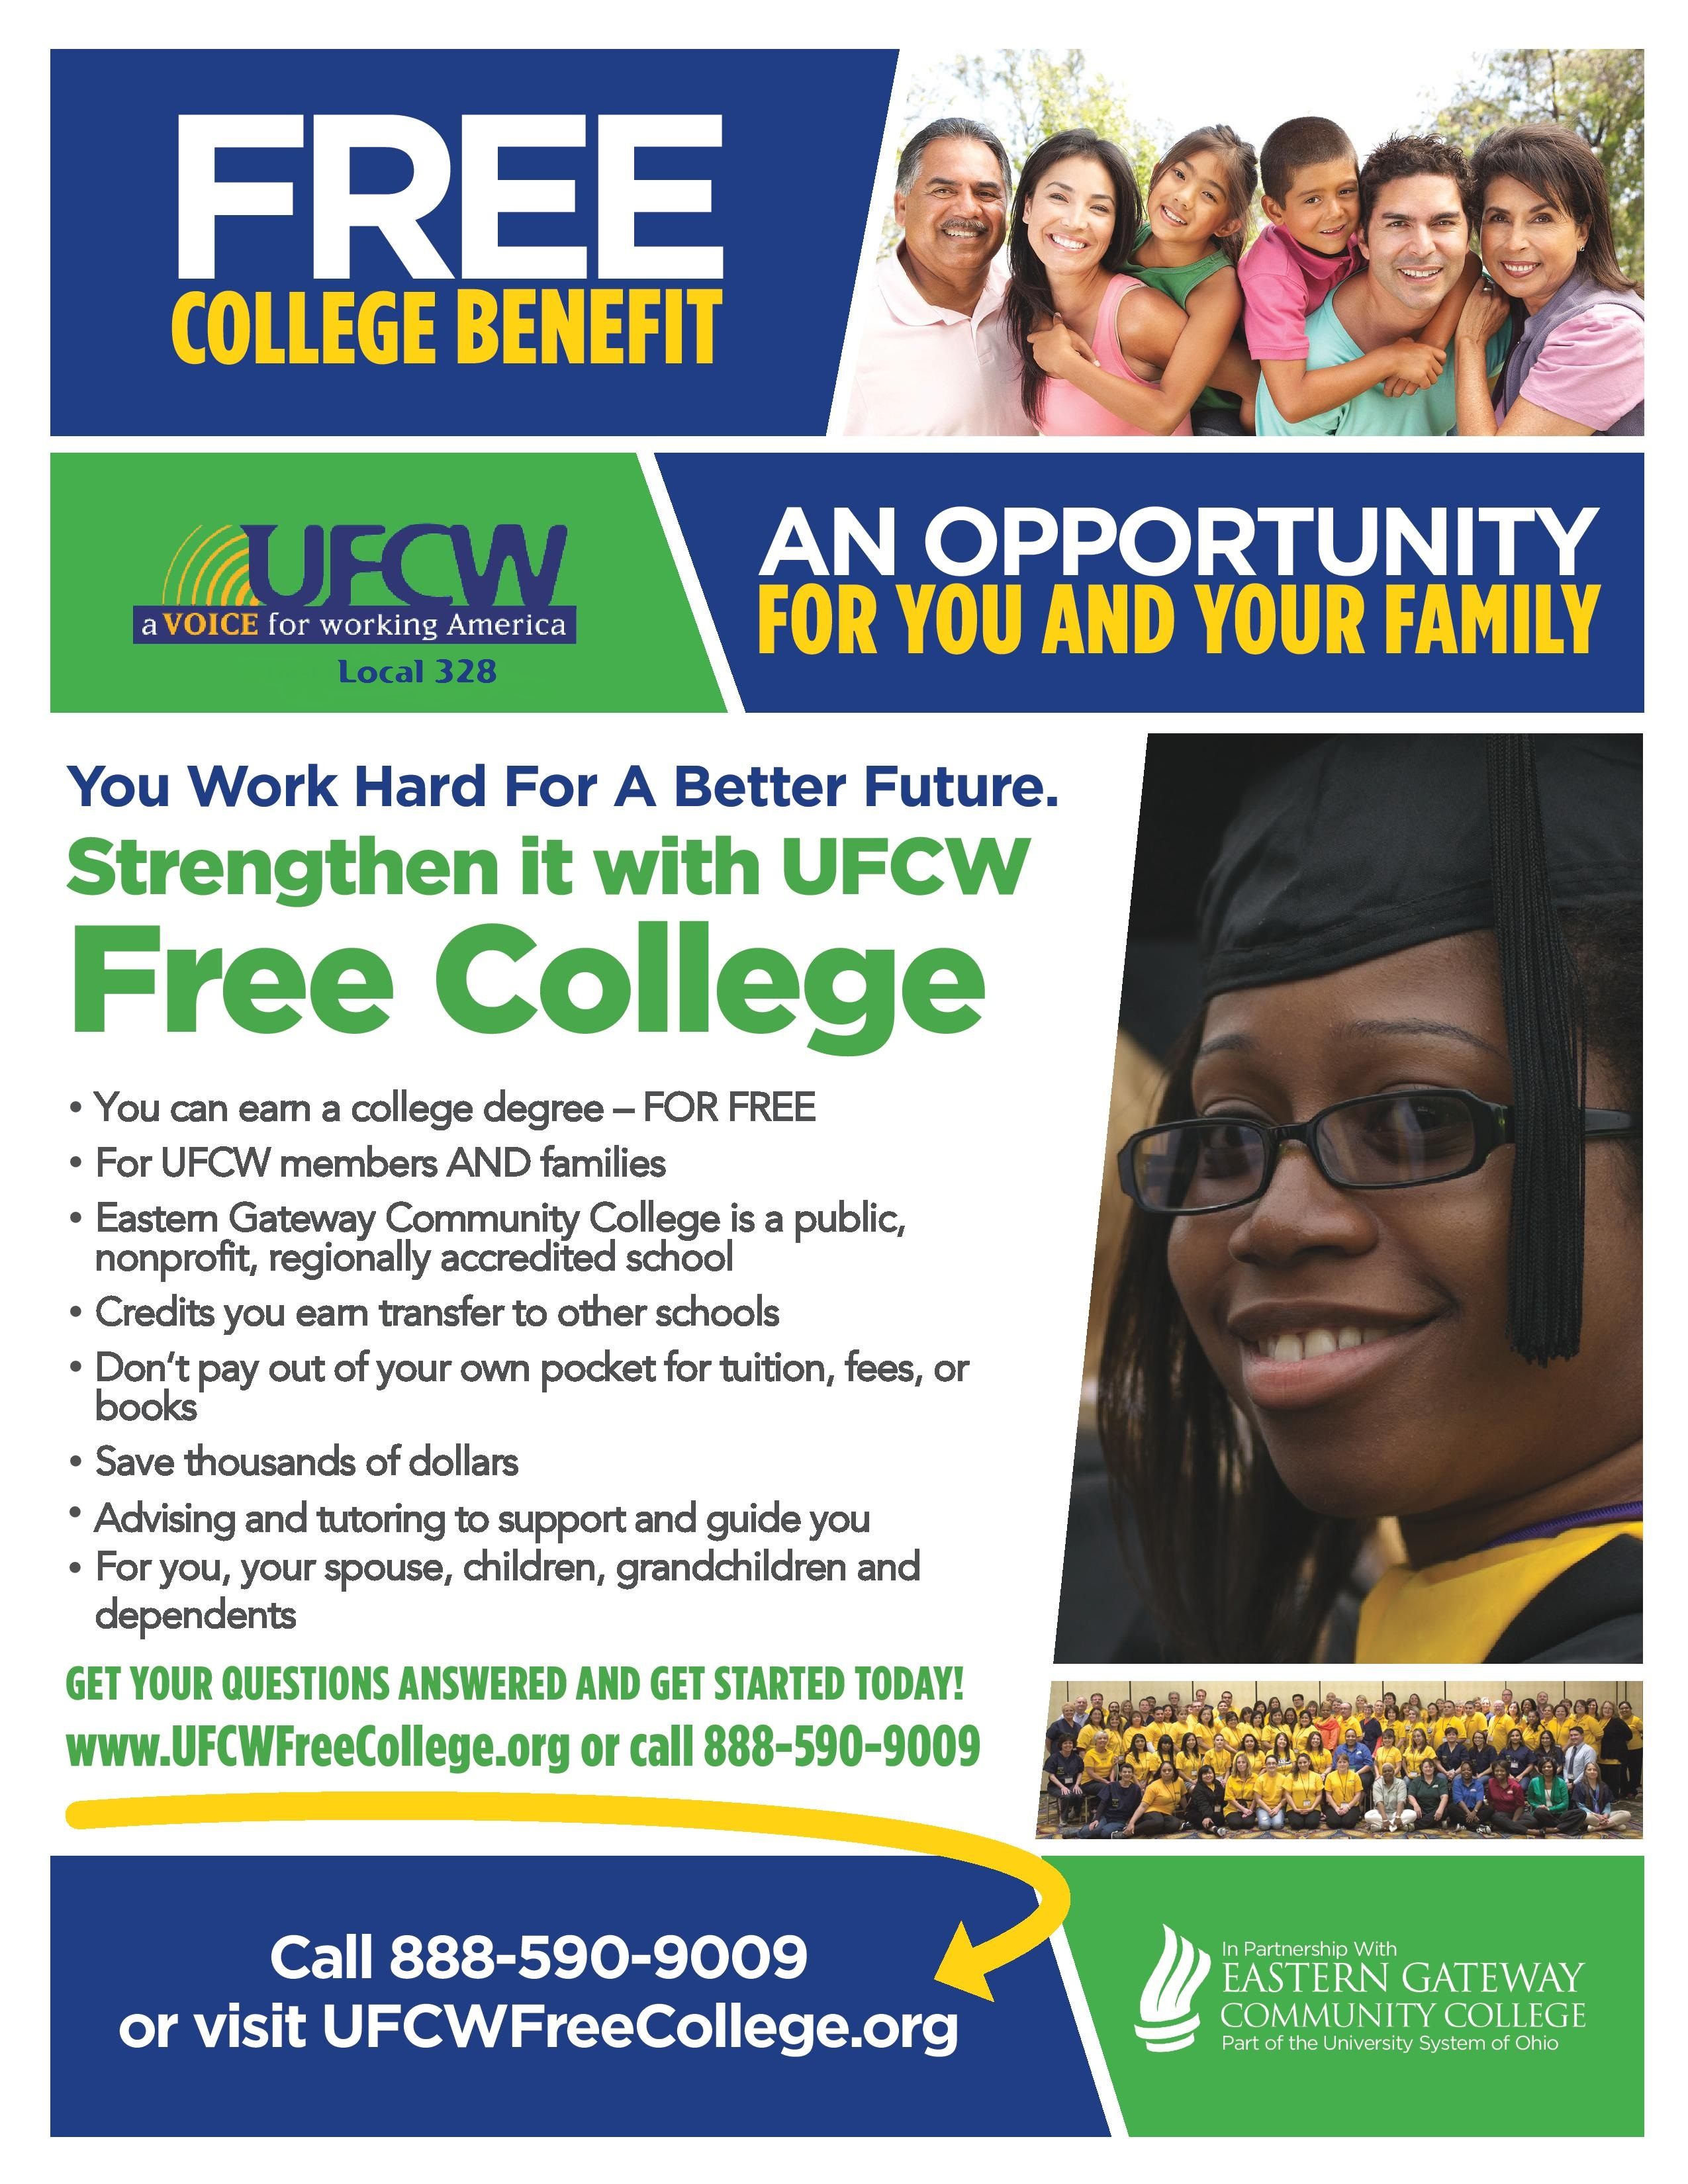 ufcw free college flyer